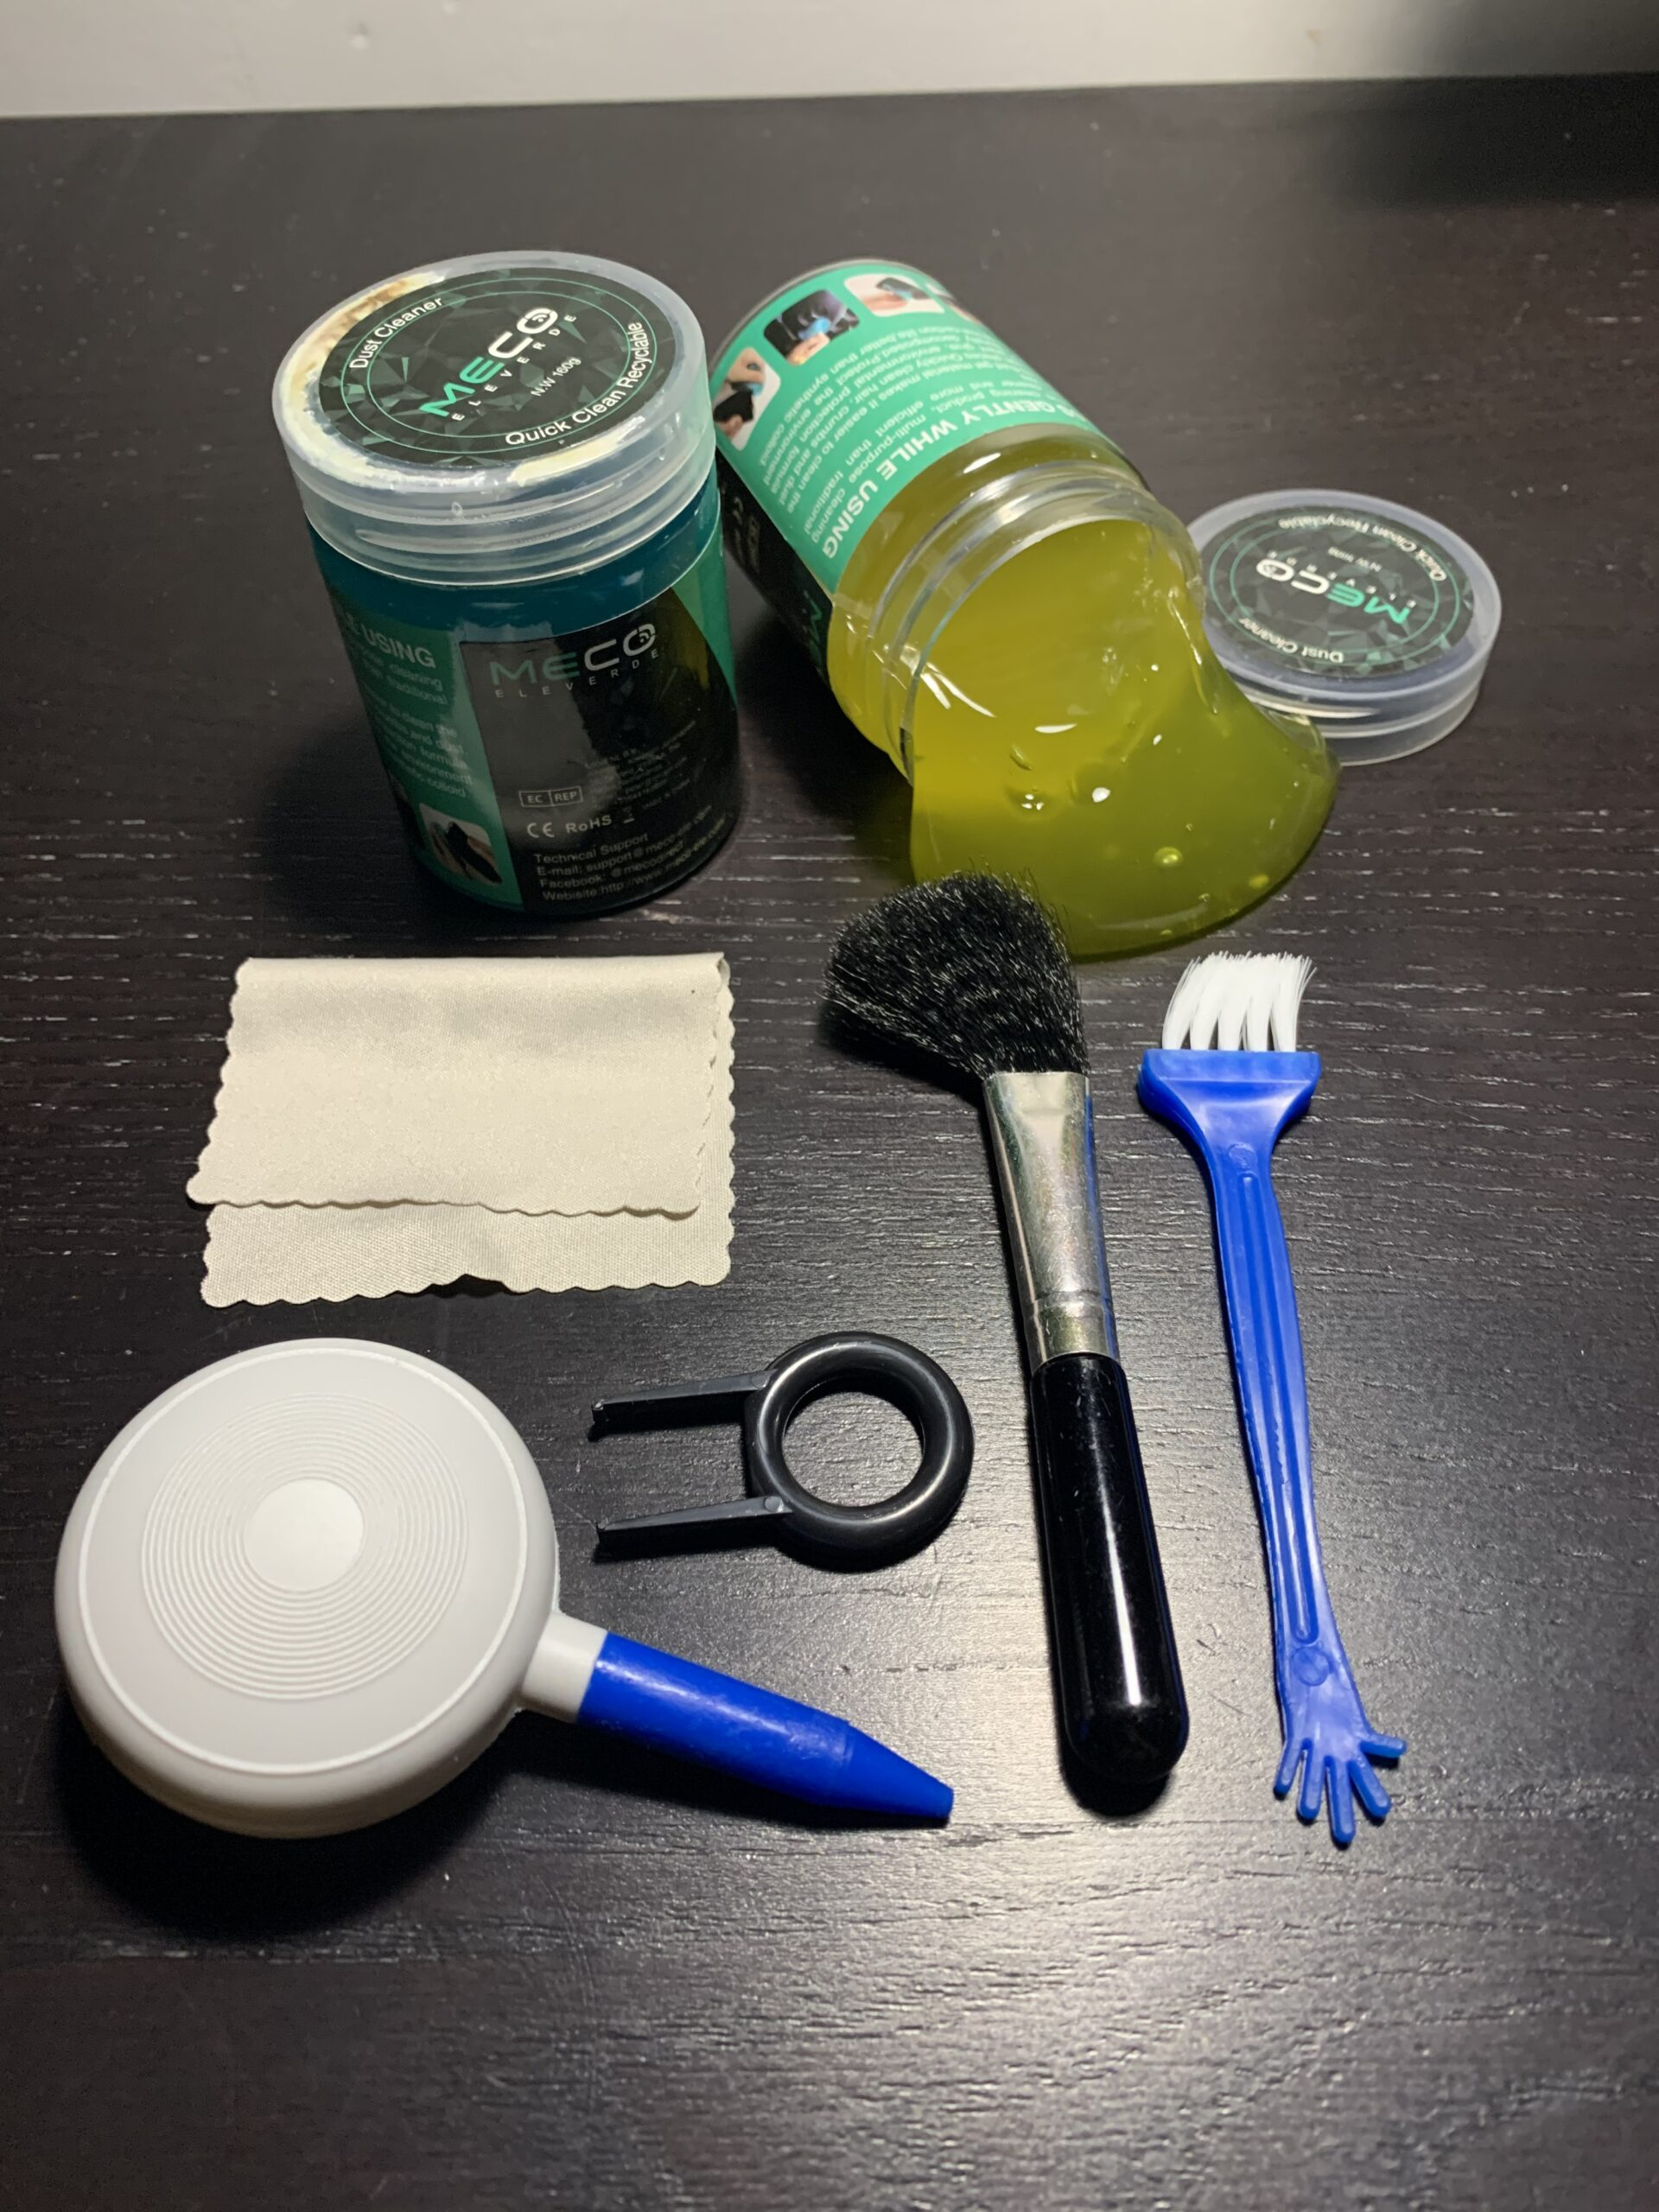 Meco Kit per Pulire la Tastiera